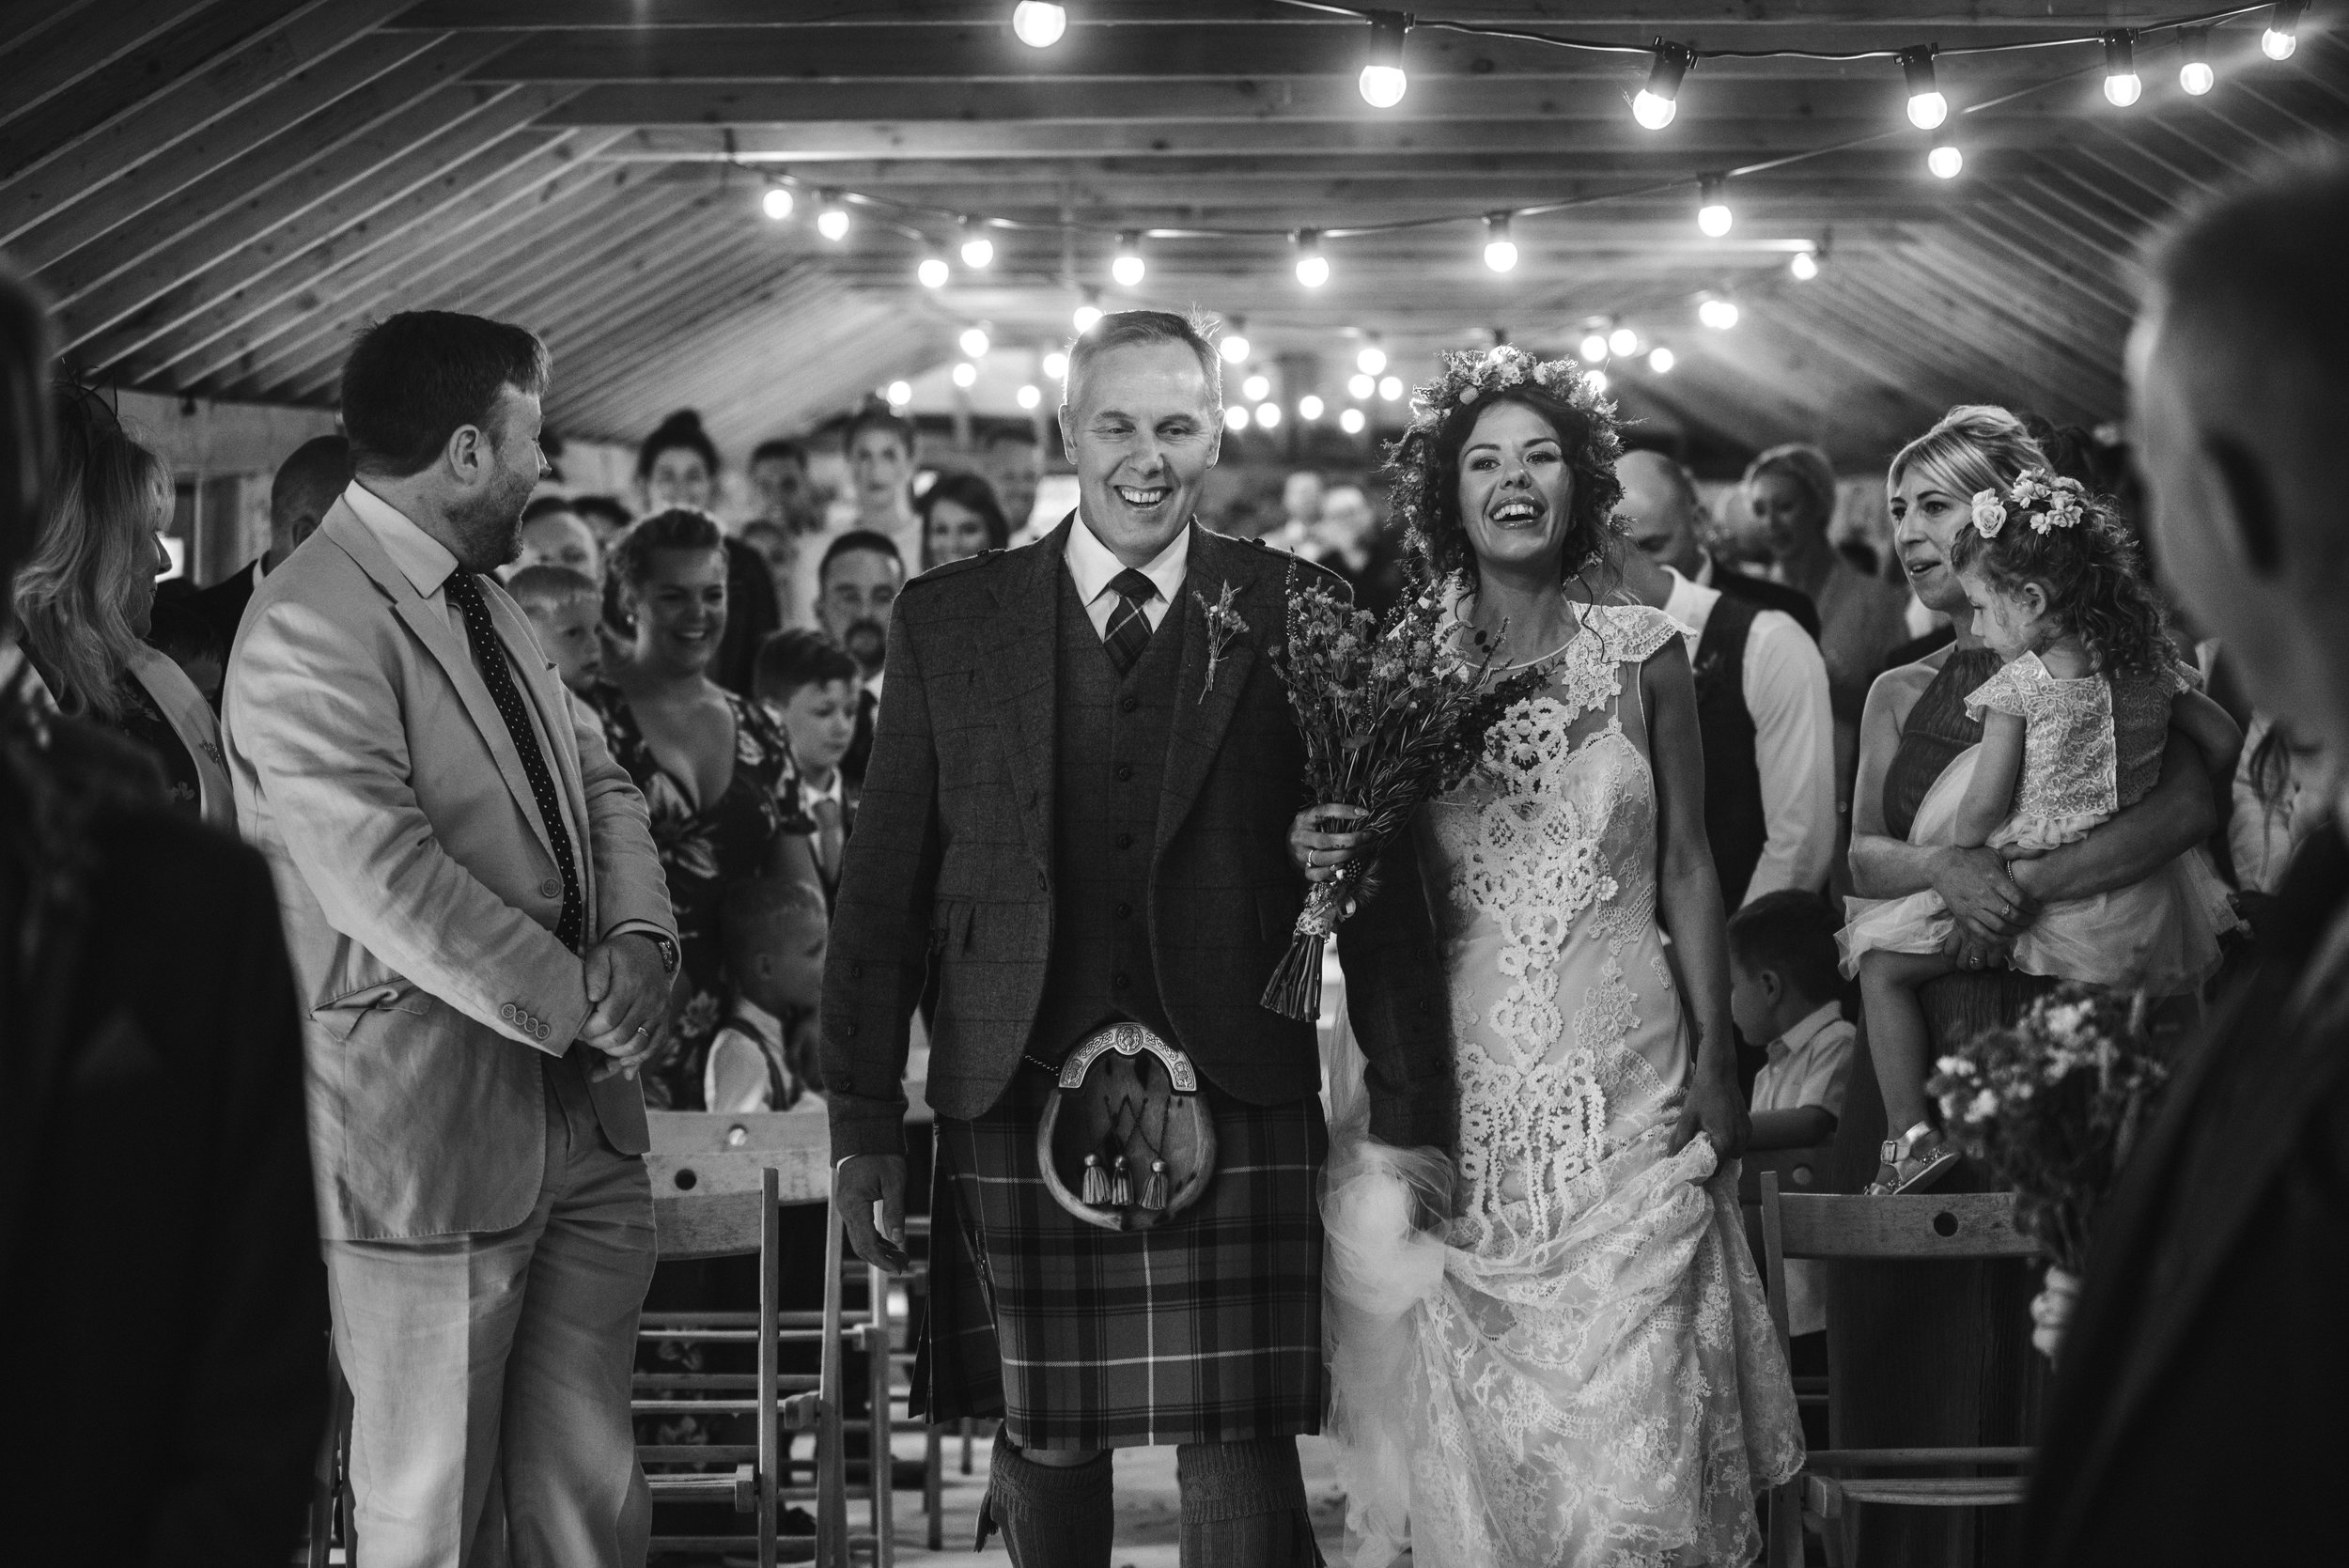 pengenna-manor-wedding-photographer-28.jpg